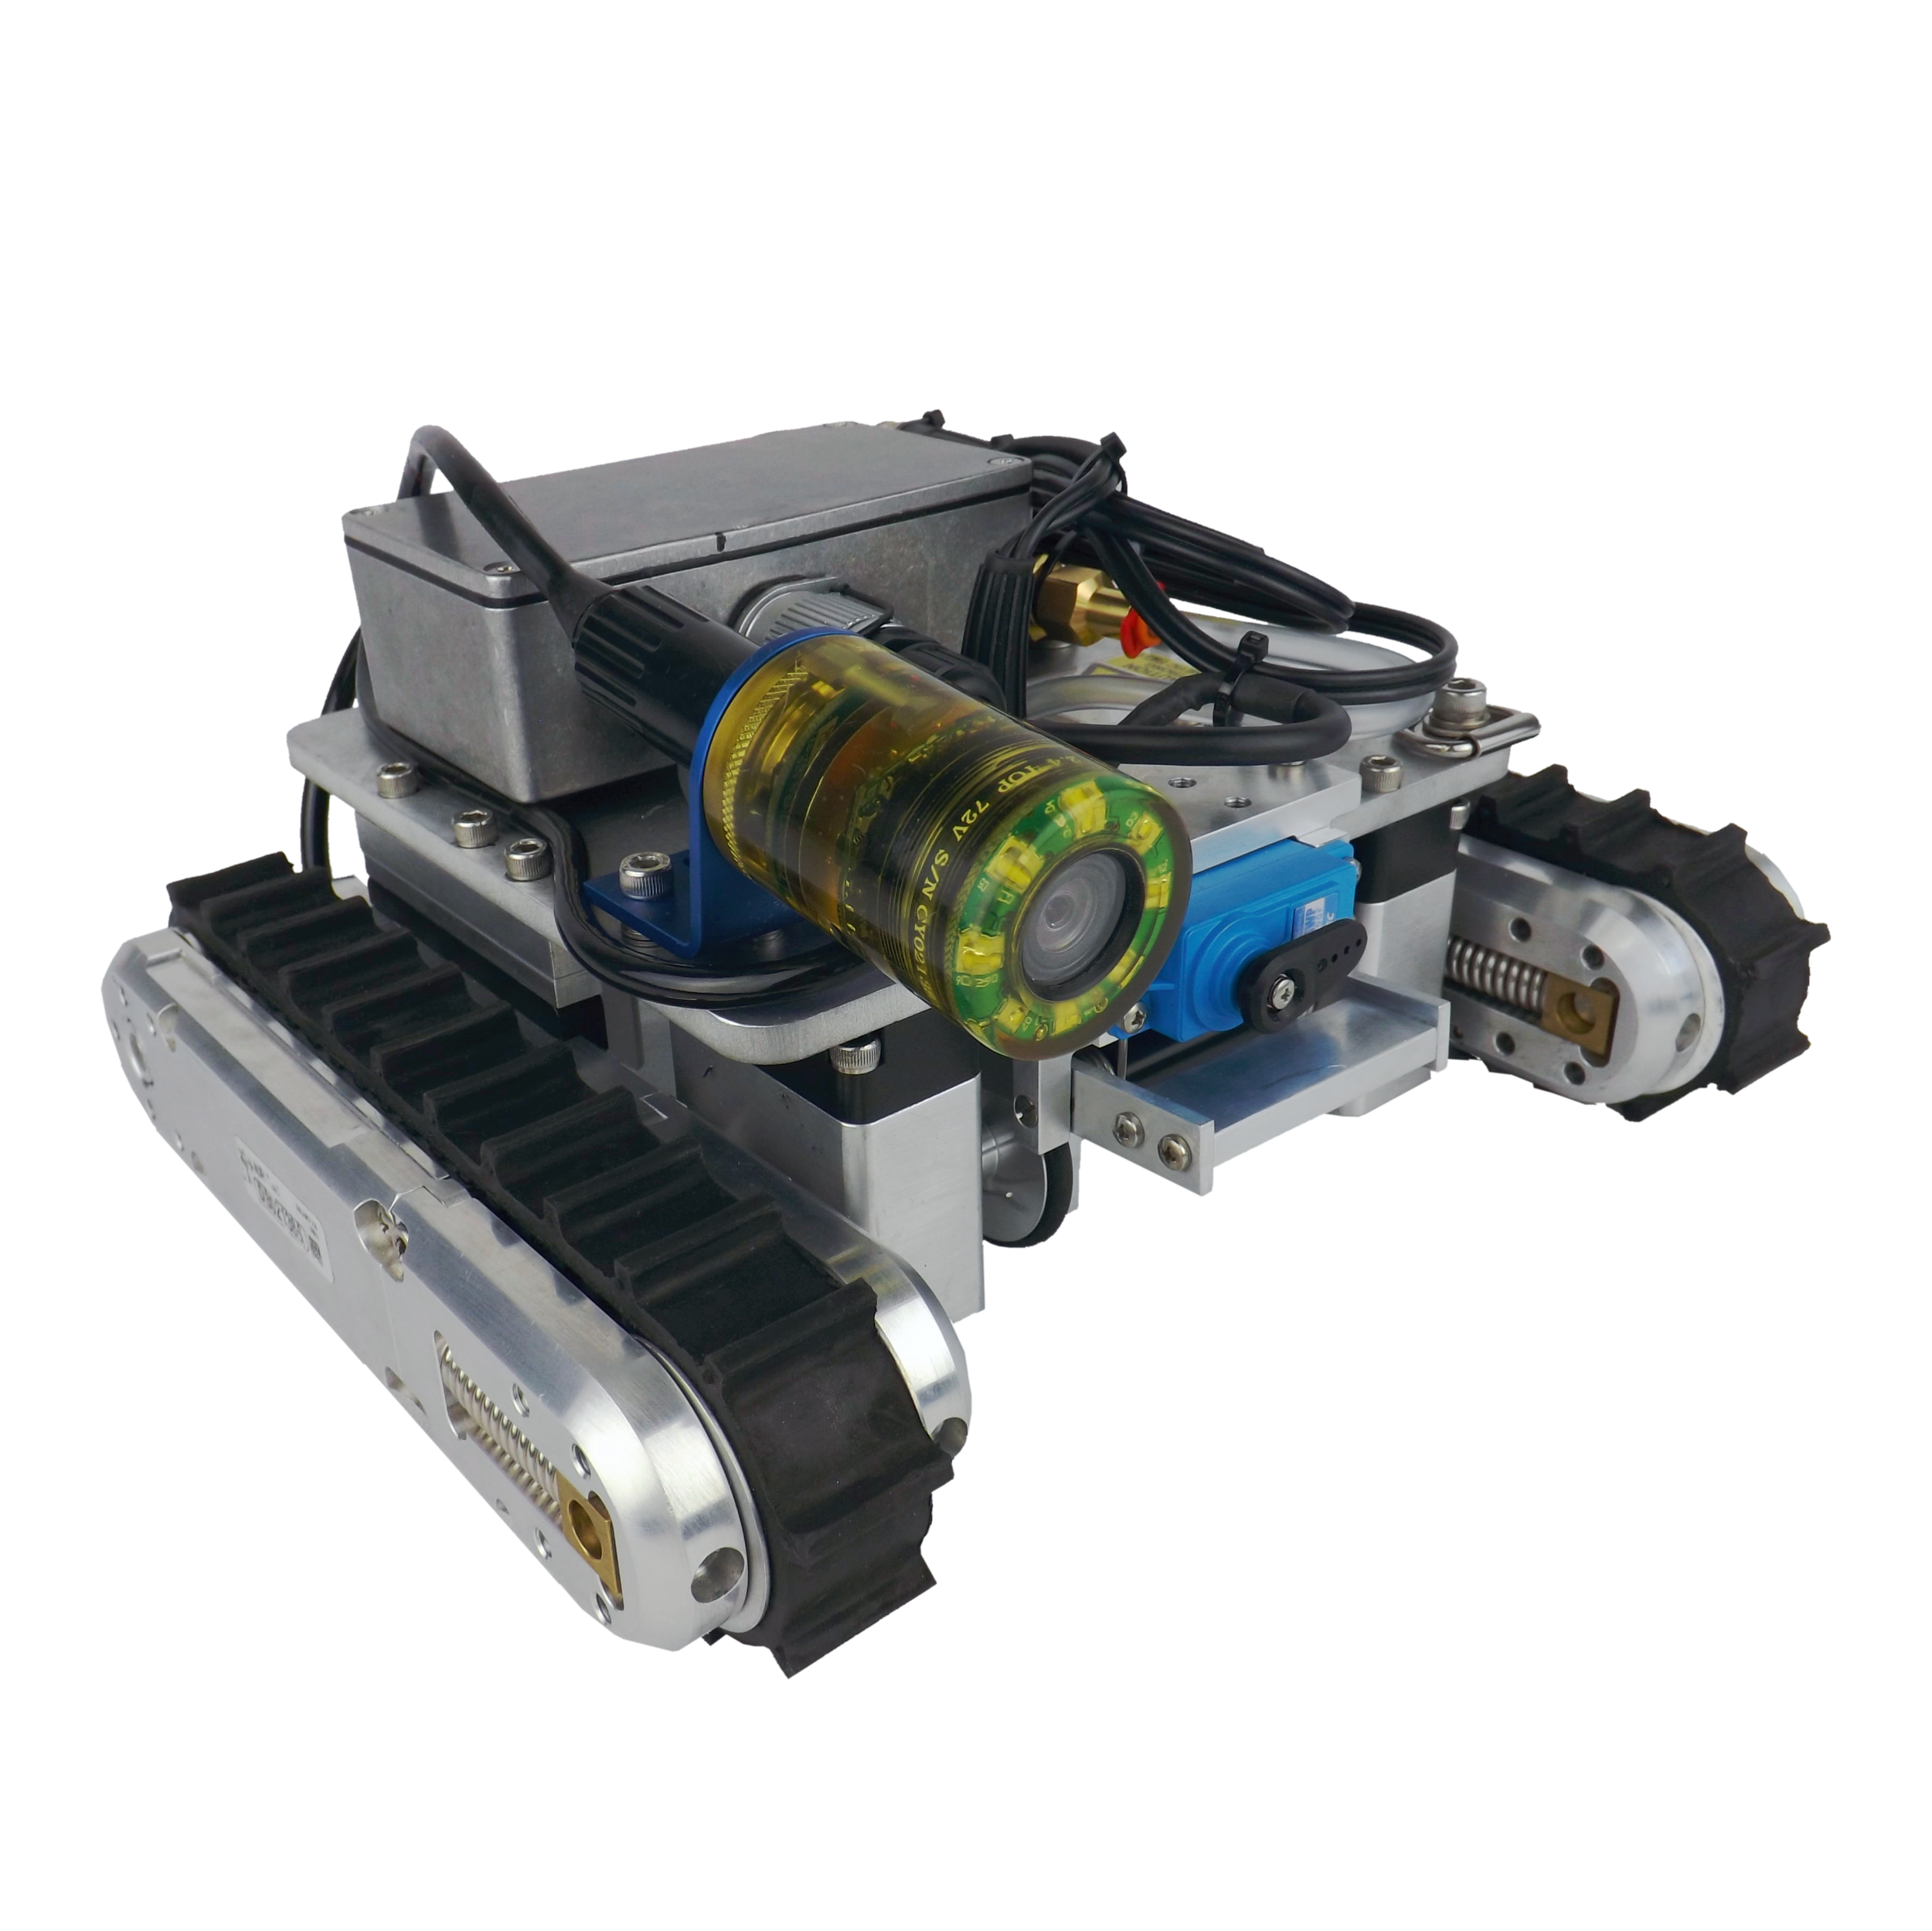 MaggUT™ Ultrasonic Testing Economical Crawler